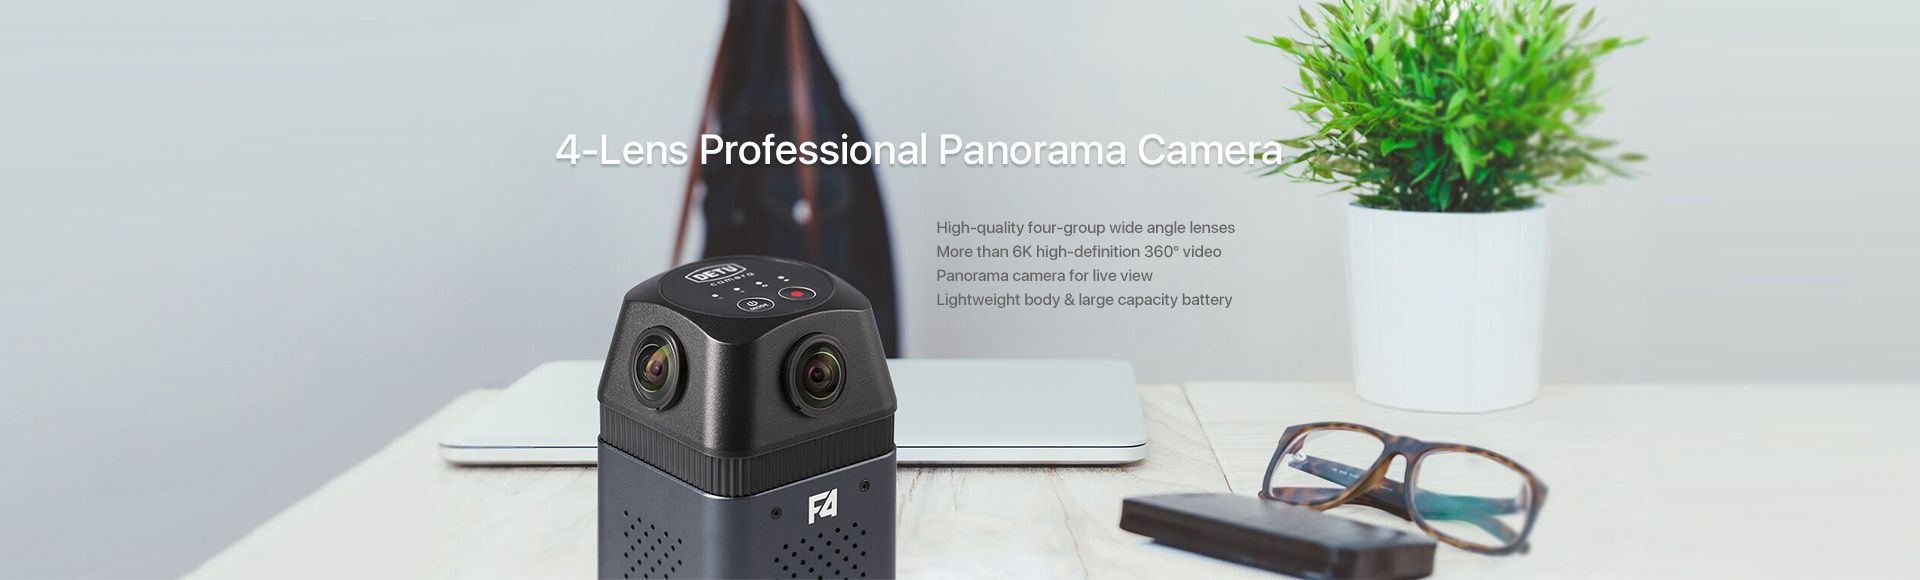 DETU F4 High Resolution Panoramic Camera - 4-Lens professional panorama camera More than 6K high-definition